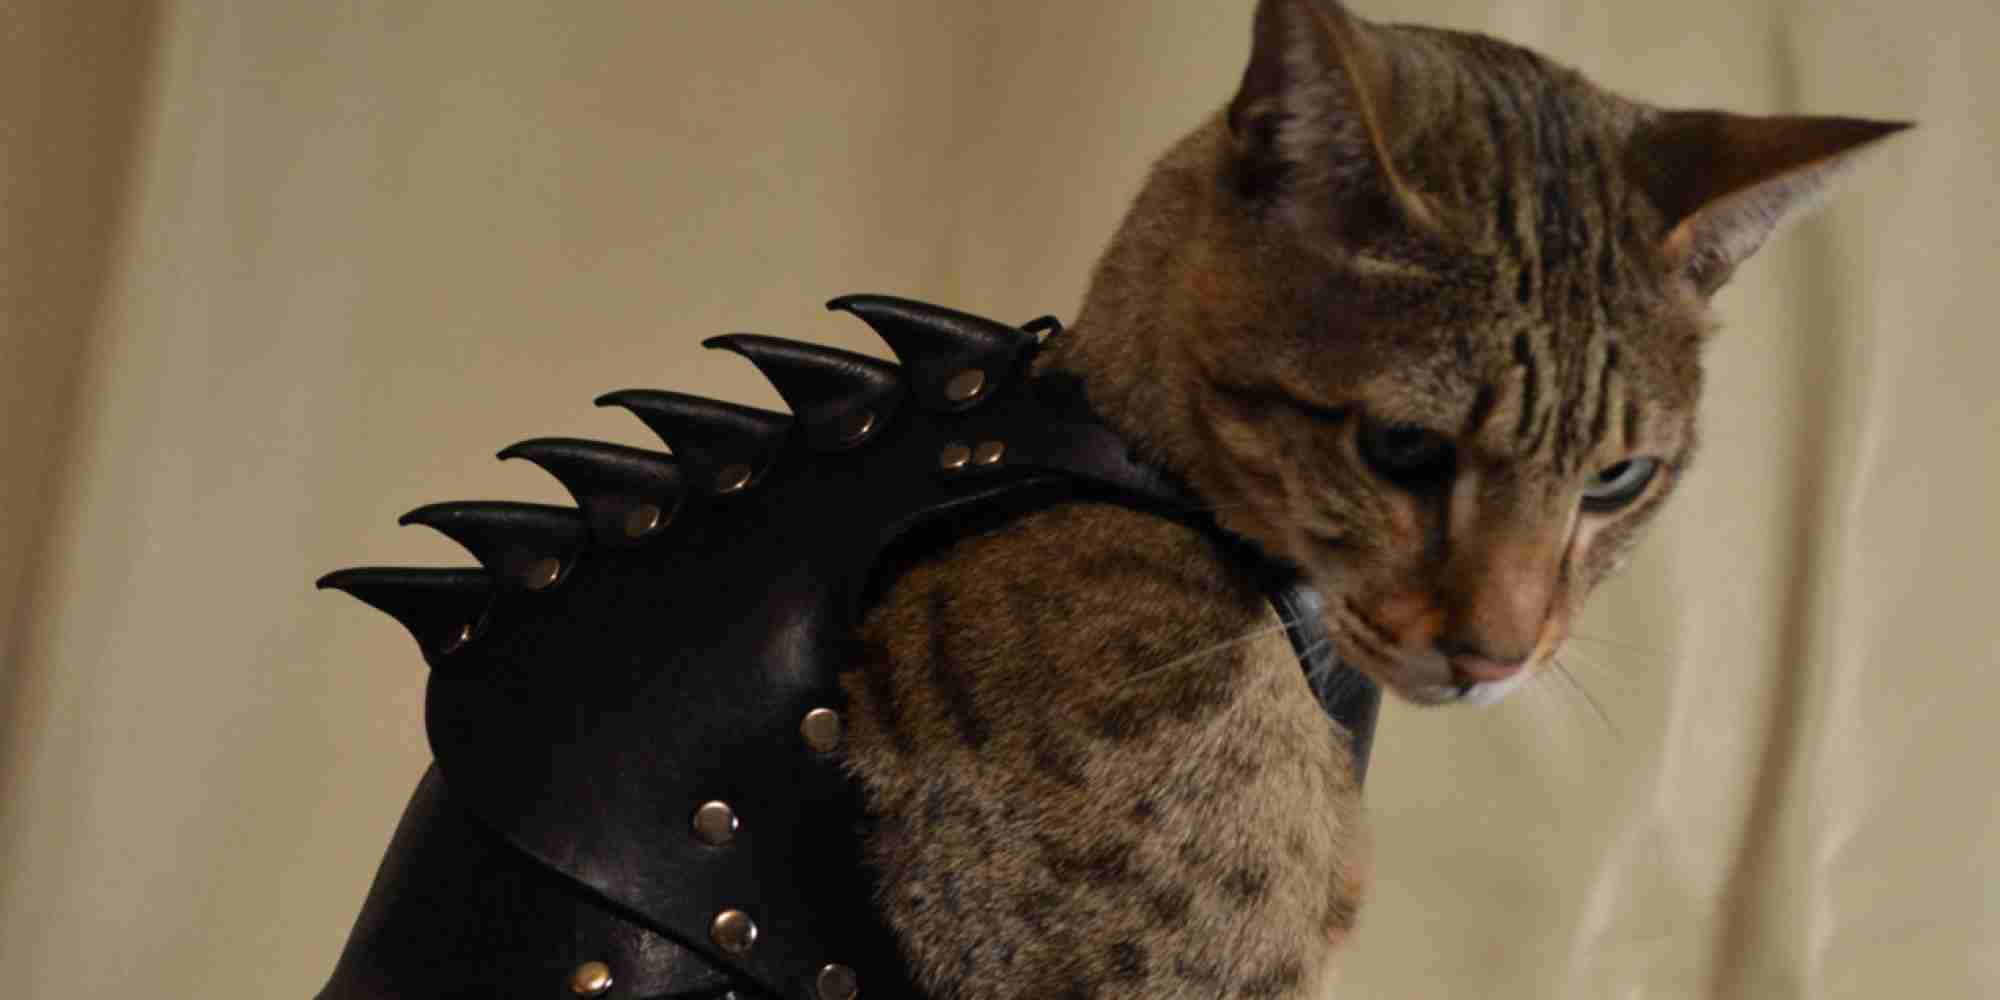 Cat Battle Armor Is Battle Armor For Your Cat (PHOTOS)